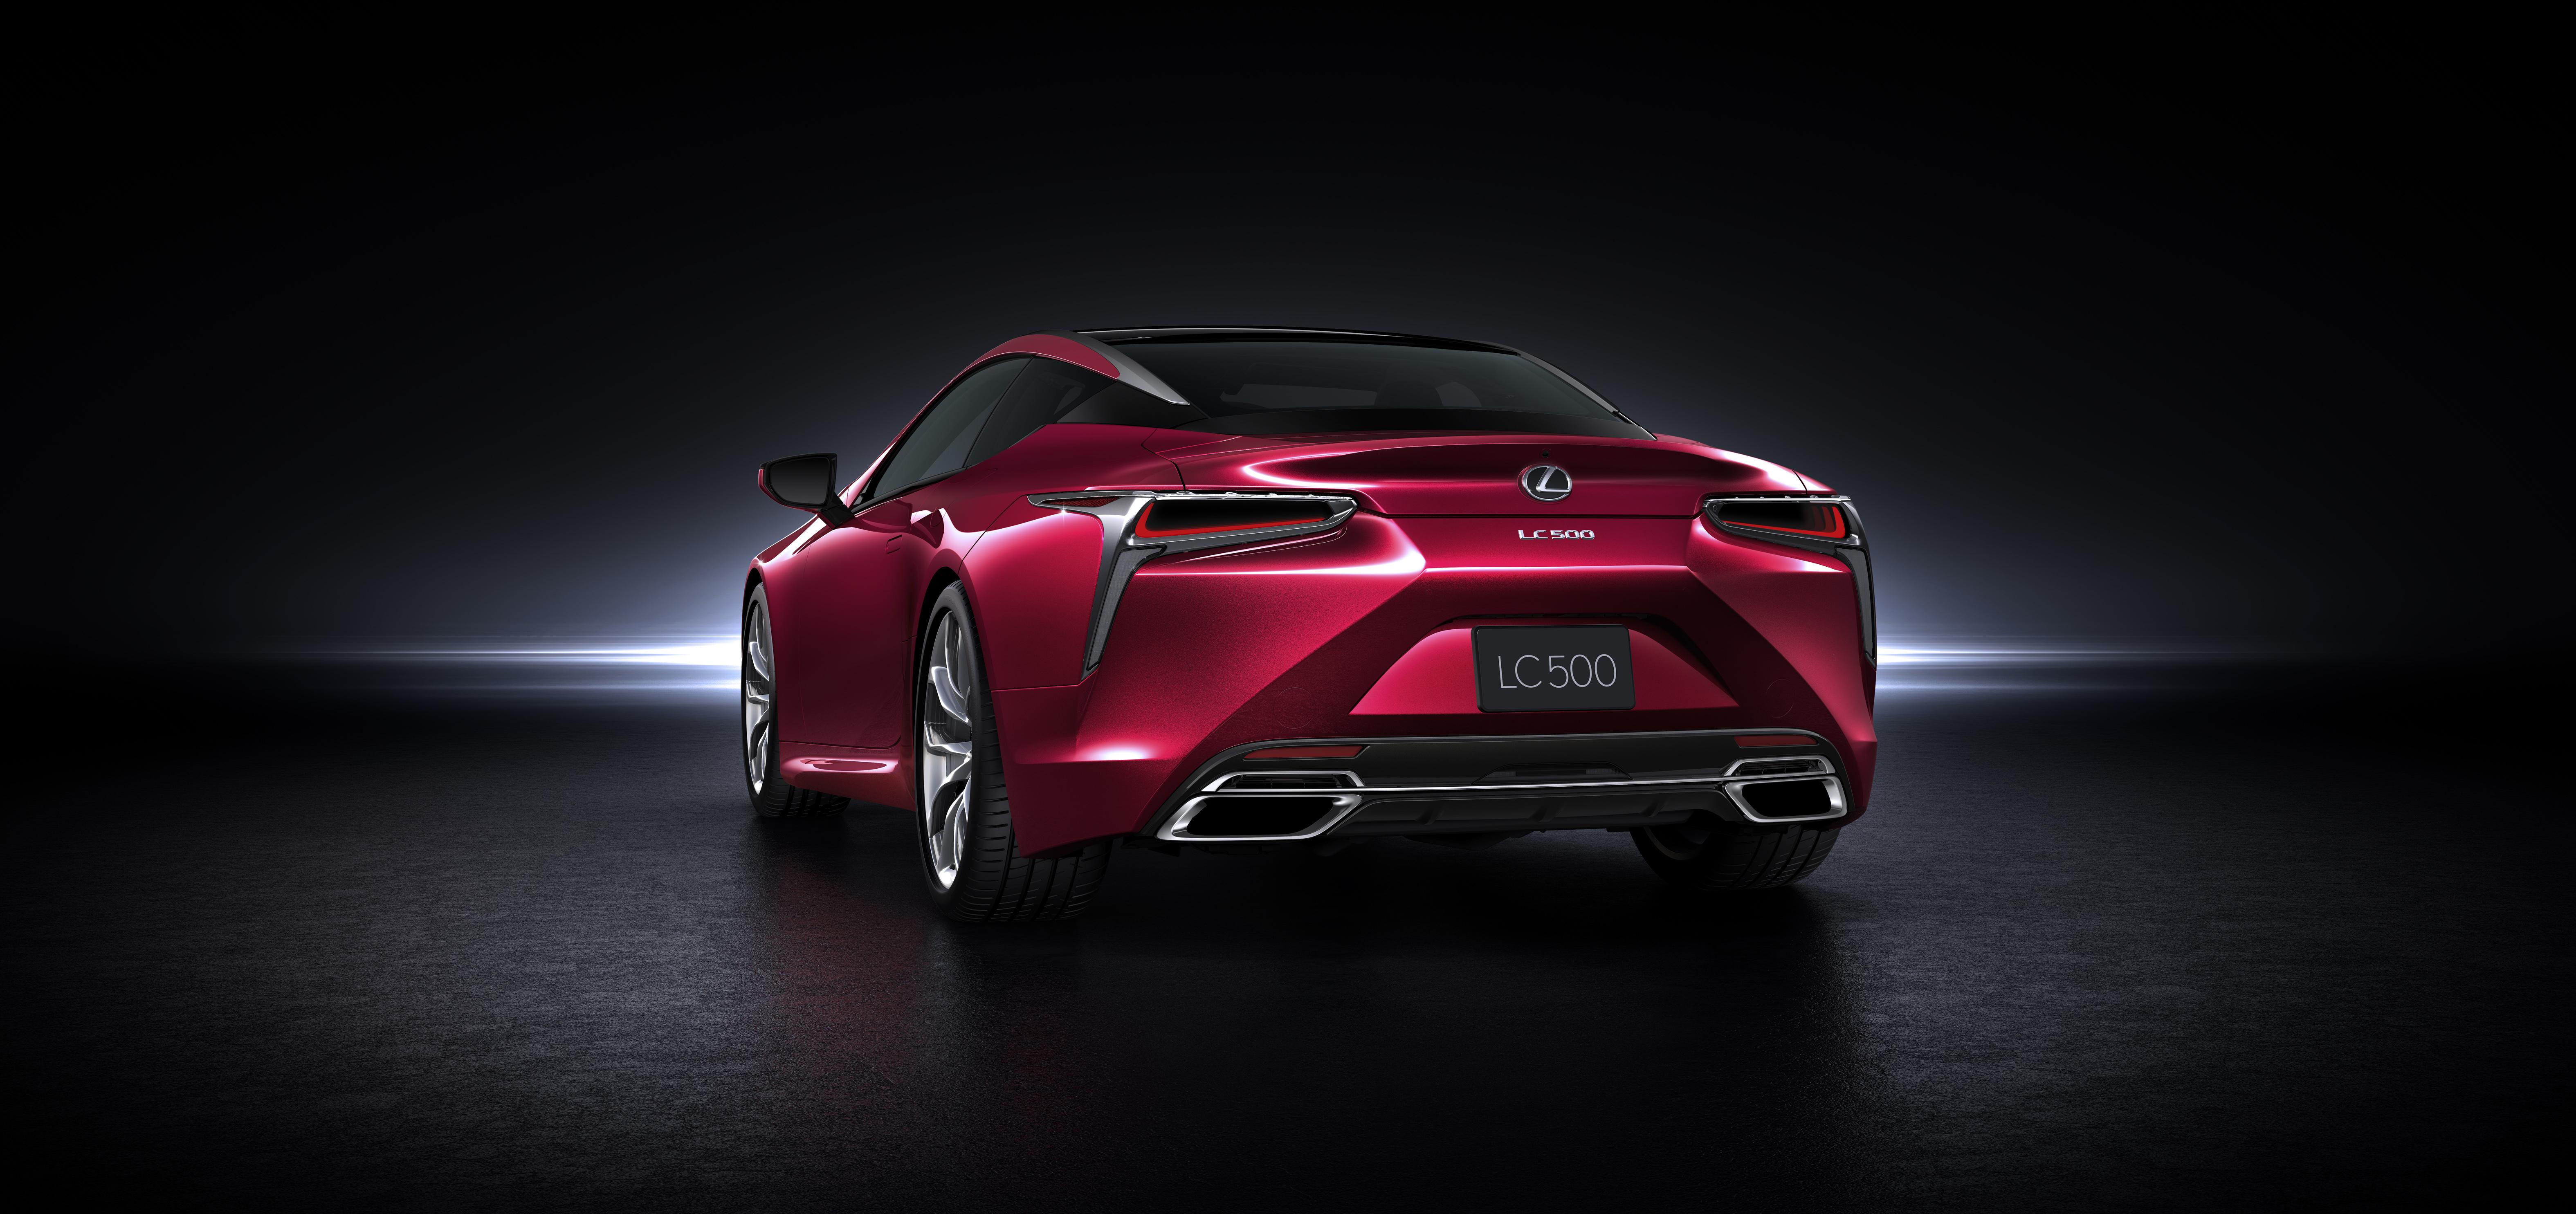 Lexus LC 500h For Desktop Background